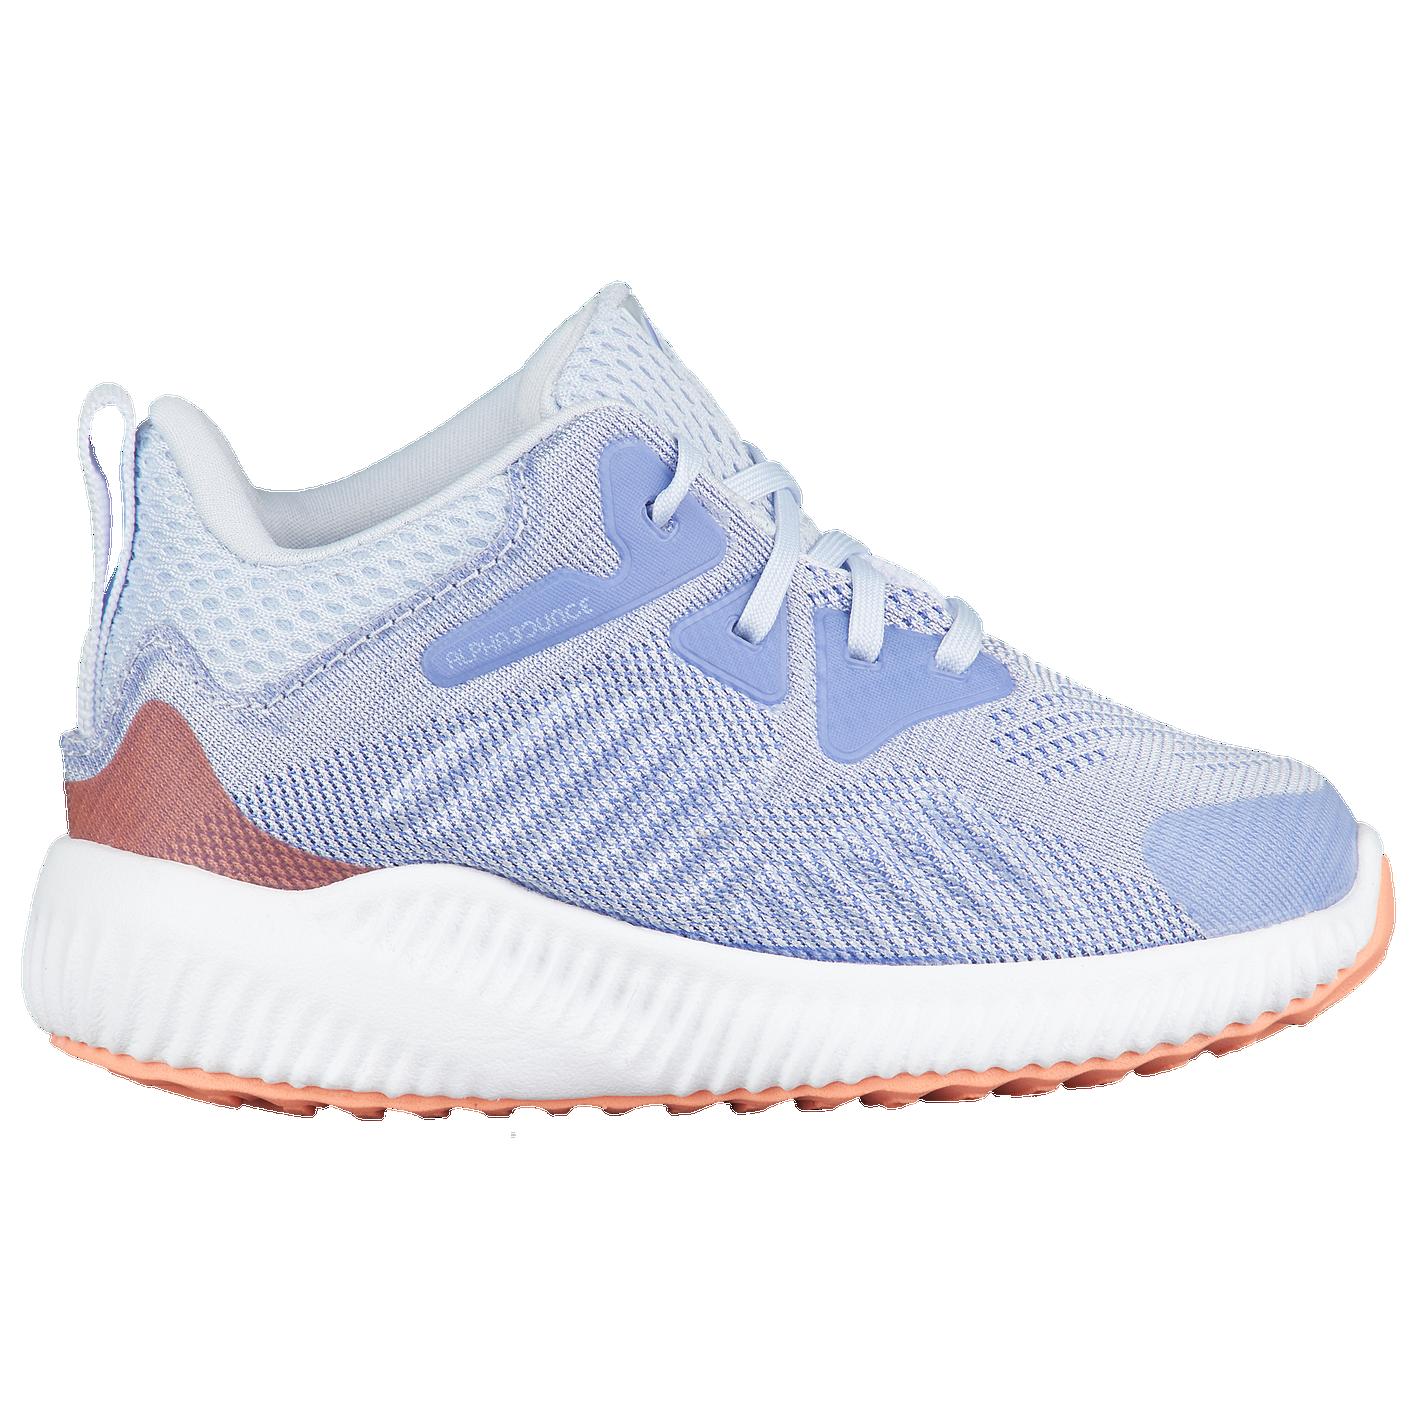 c12749388 adidas Alphabounce Beyond - Girls  Toddler - Running - Shoes - Aero ...